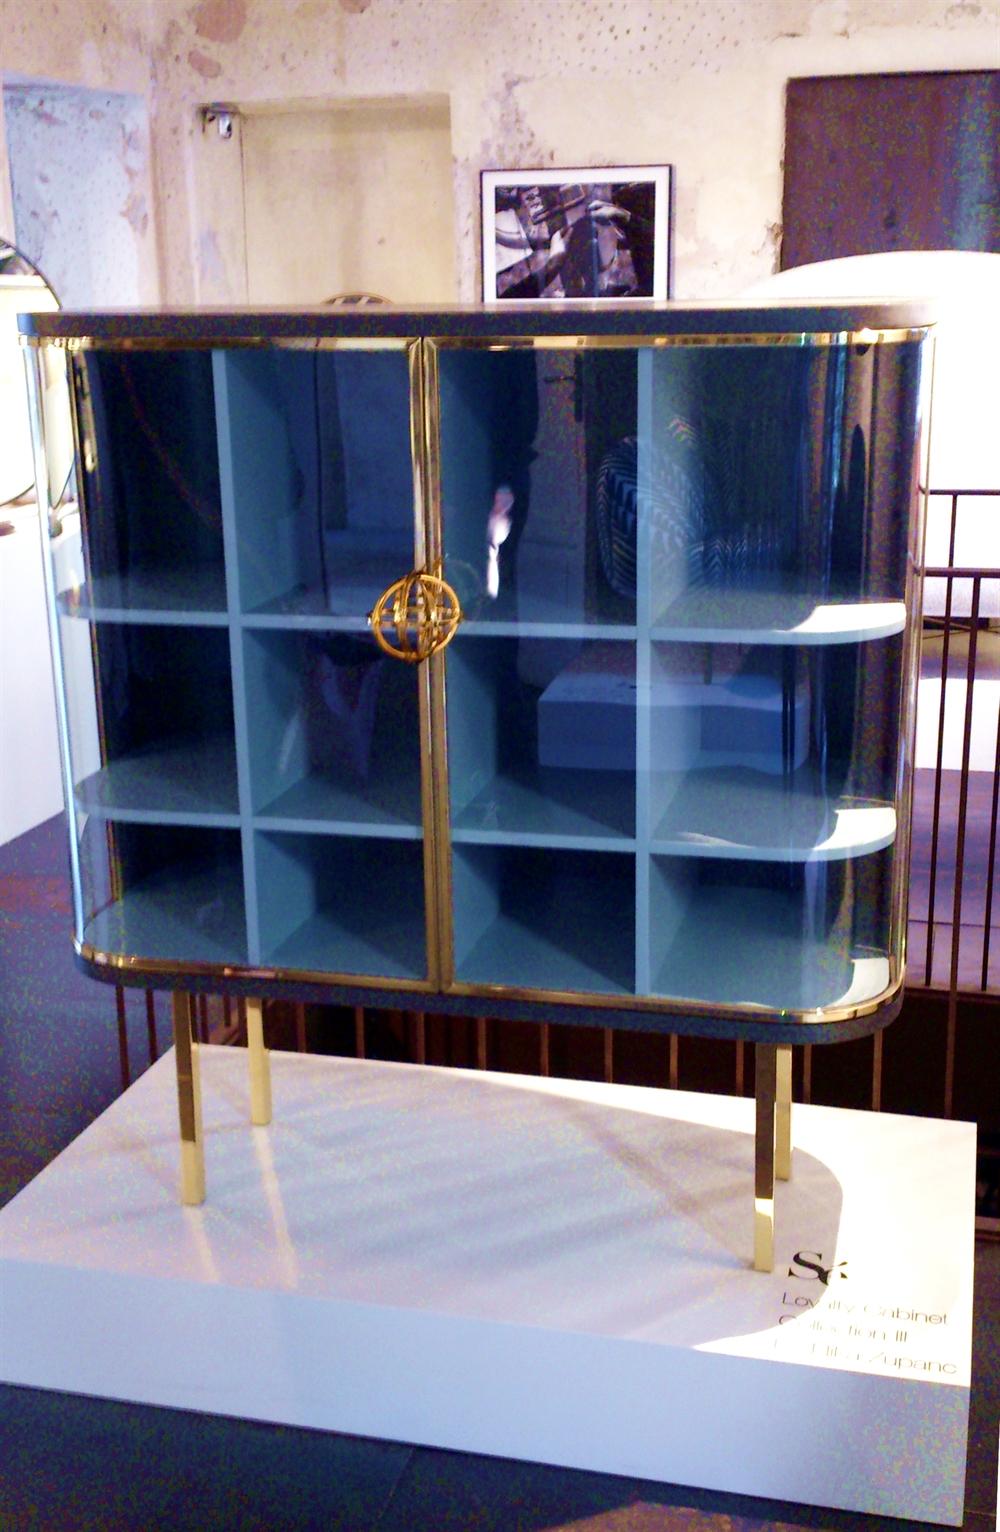 13 fuorisalone milan design week 2015 rossana orlandi nika zupanc gufram marimekko scarlet splendour interior design luxurious furniture meble luksusowe projektowanie marcel wanders